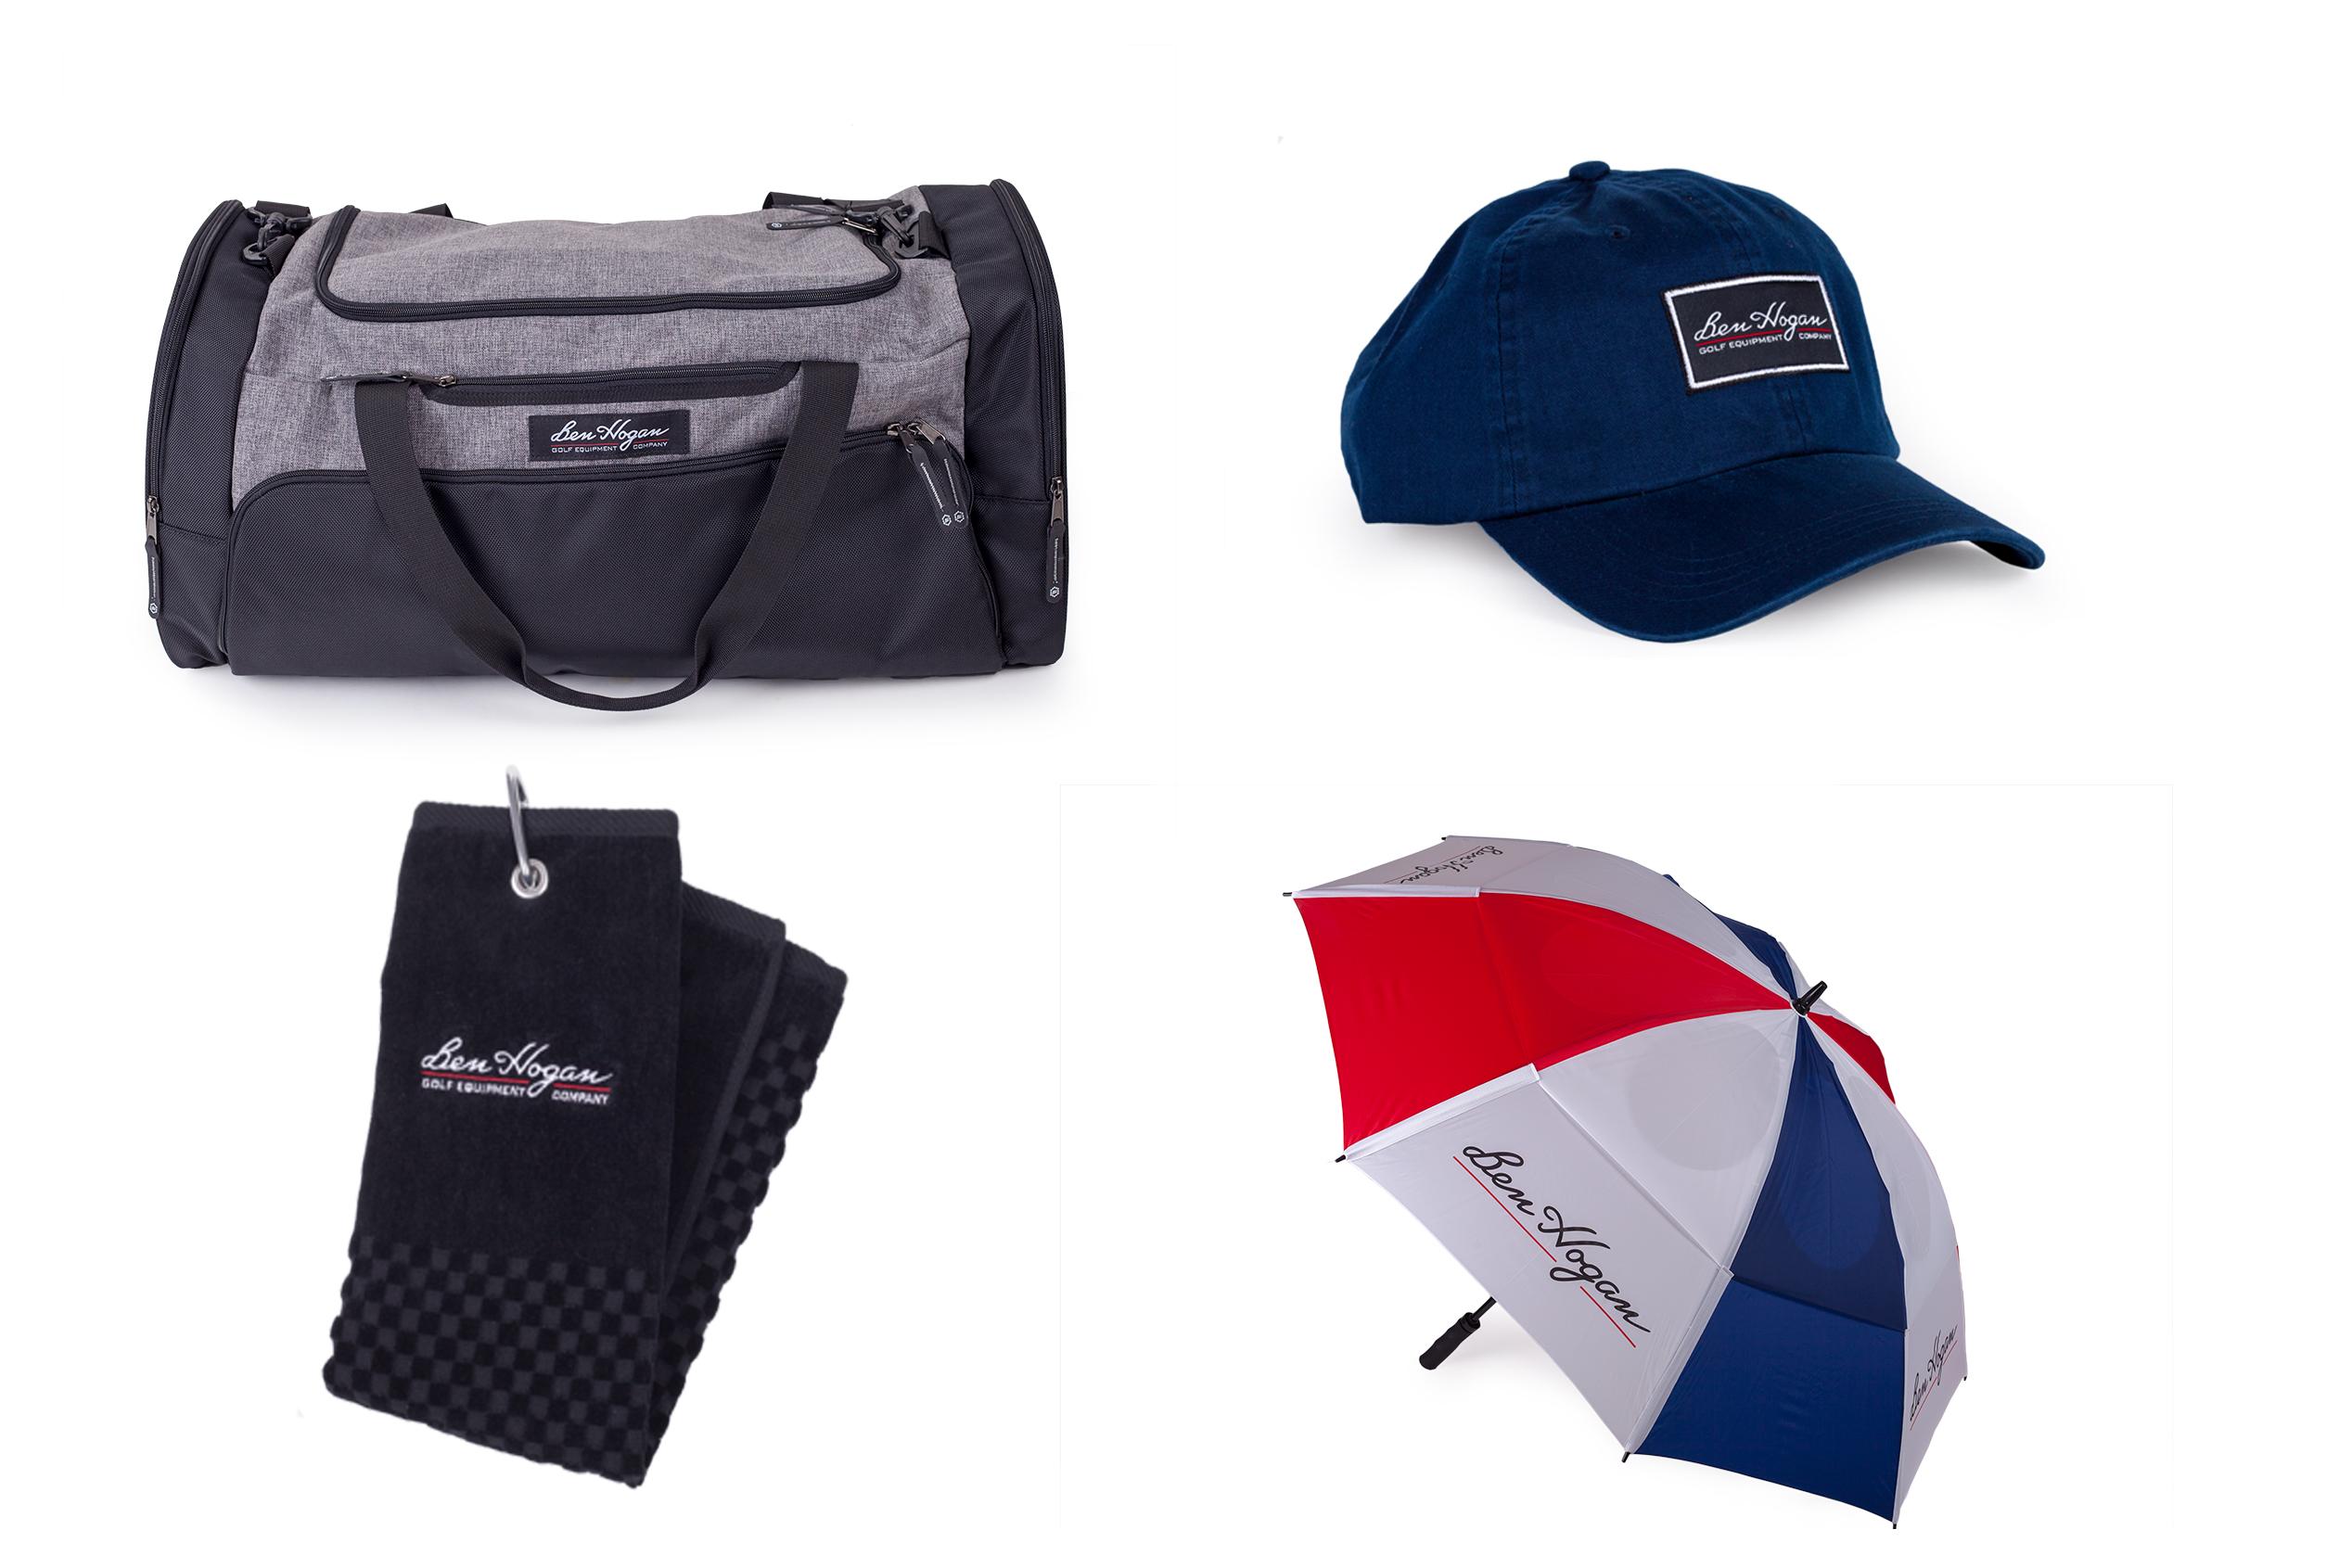 Ben Hogan Golf Equipment launch accessories for 2018 | GolfMagic